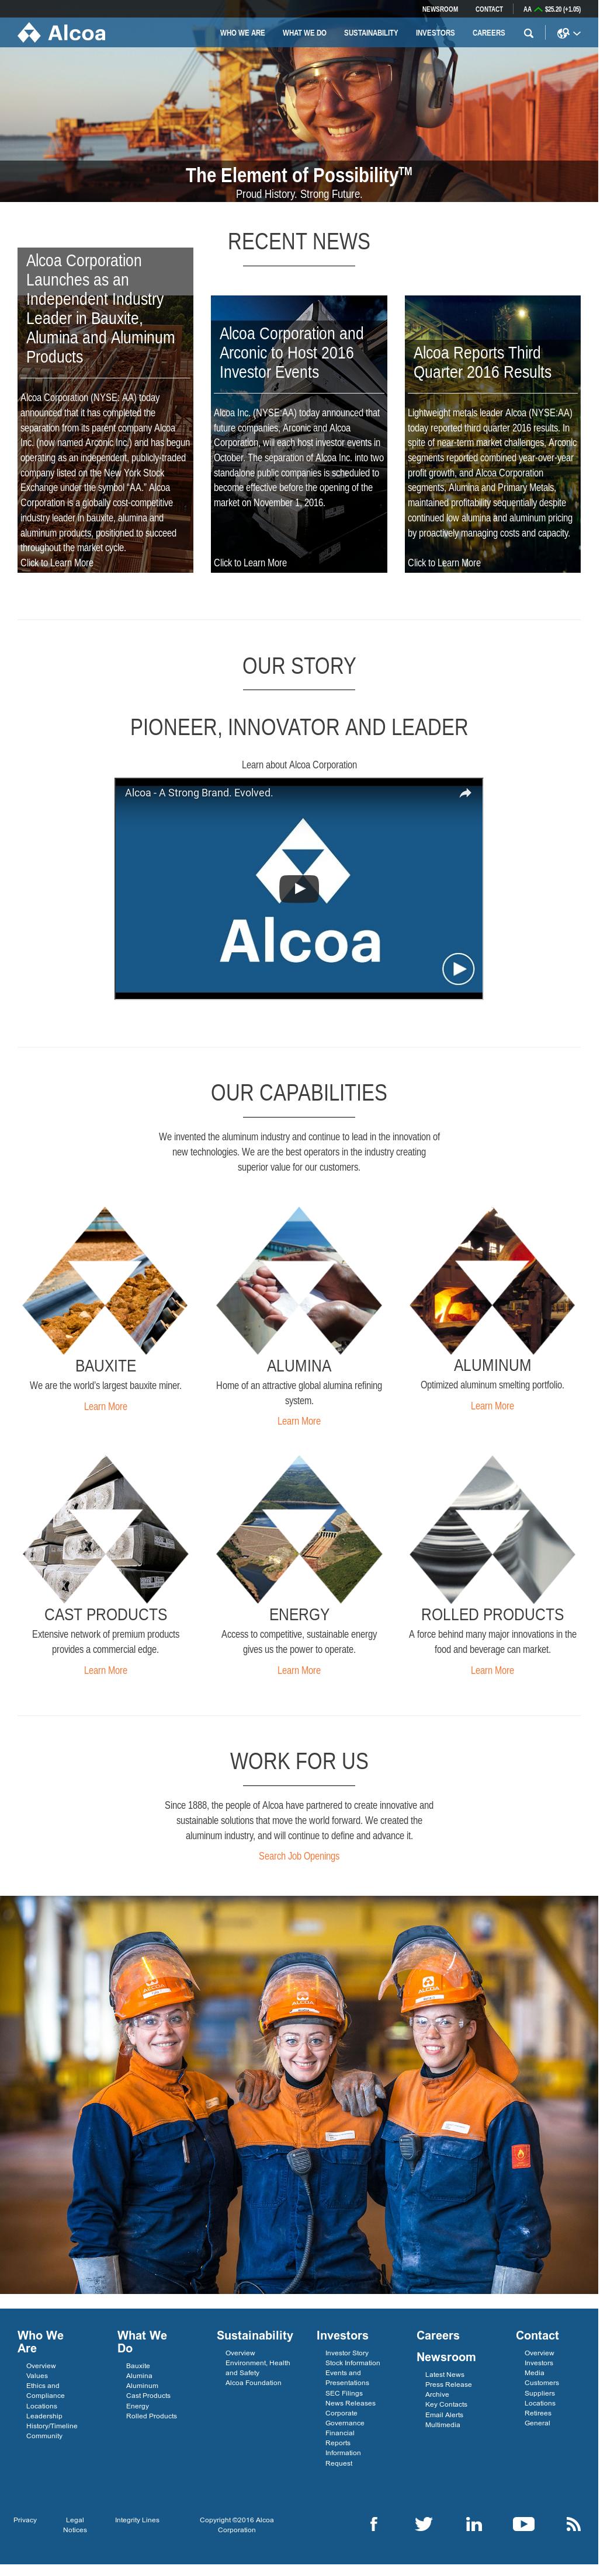 Alcoa Competitors, Revenue and Employees - Owler Company Profile